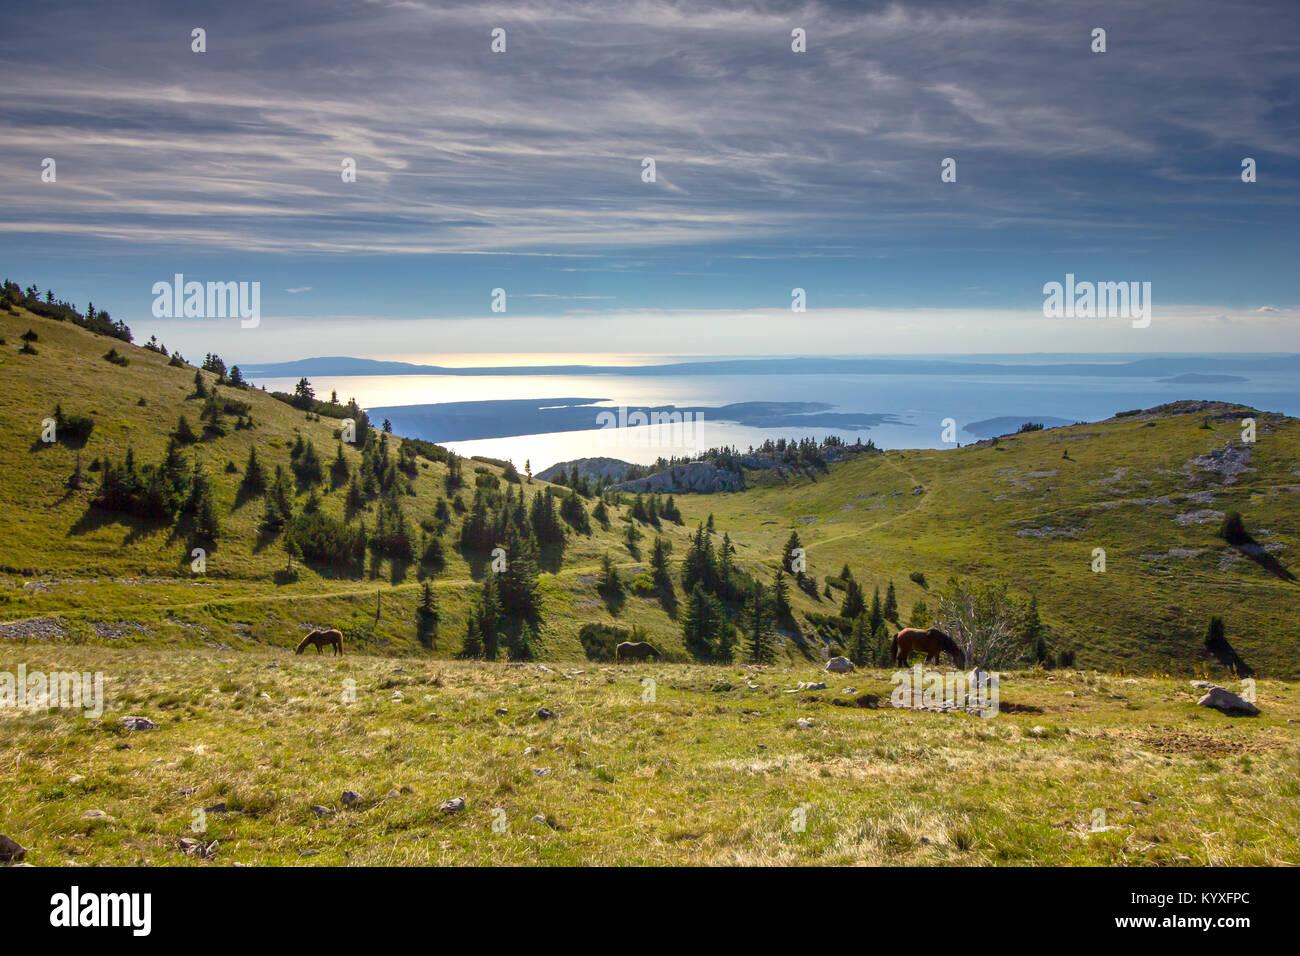 Adriatic sea and islands viewed from Zavizan in the Northern Velebit National Park, Croatia -  Aug 2016 Stock Photo